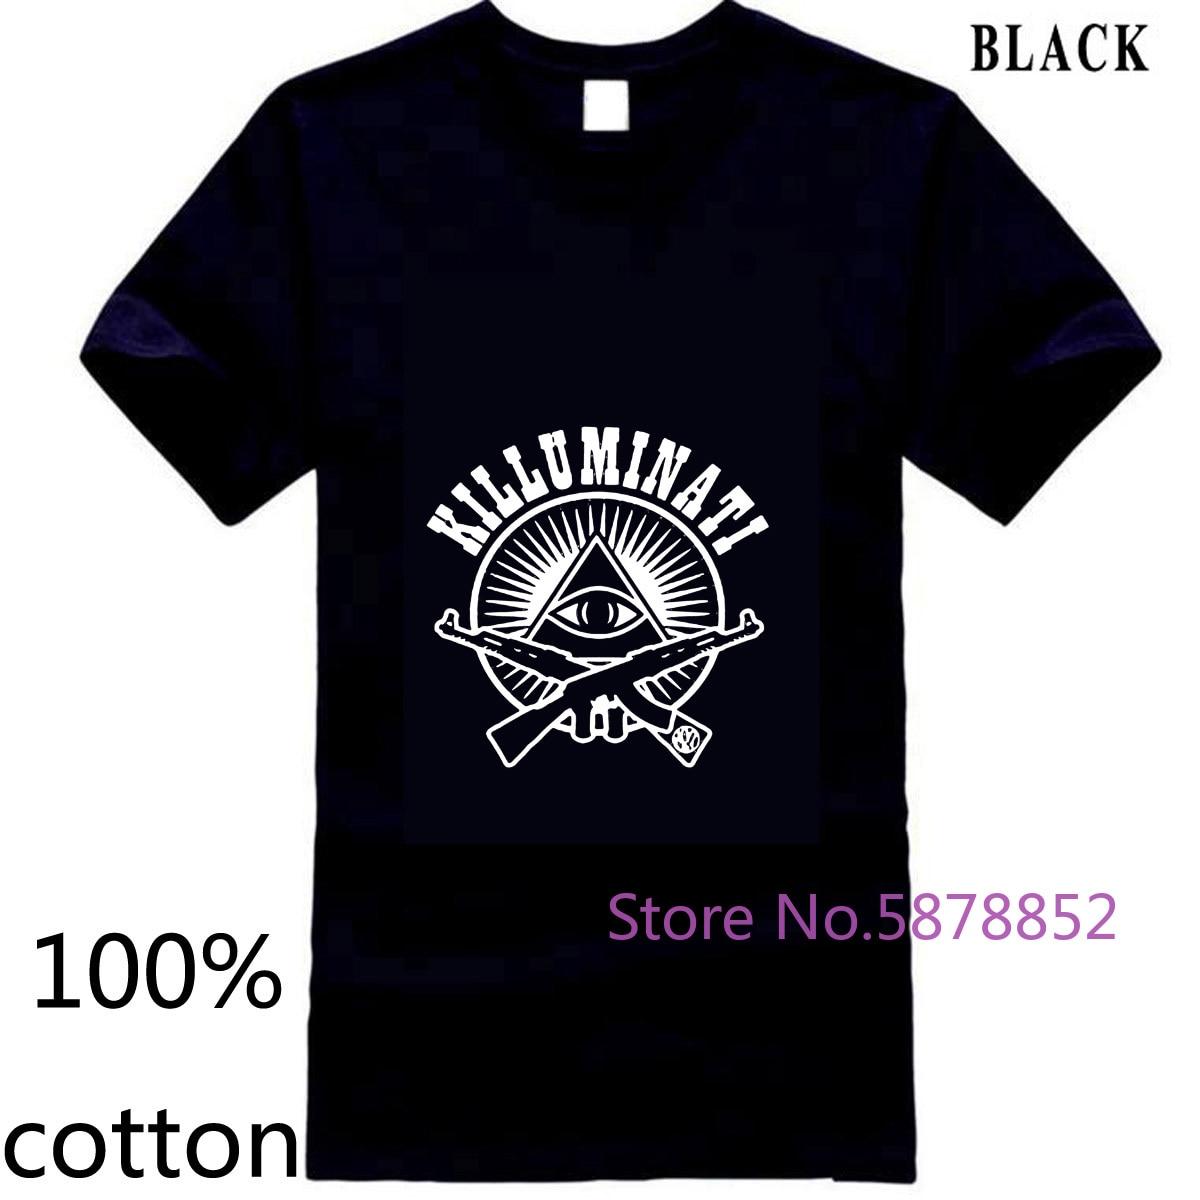 Nuevo Killuminati Illuminati Nueva Orden Mundial ojo Logo negro para hombres camiseta tops camisetas 100% algodón Hombre